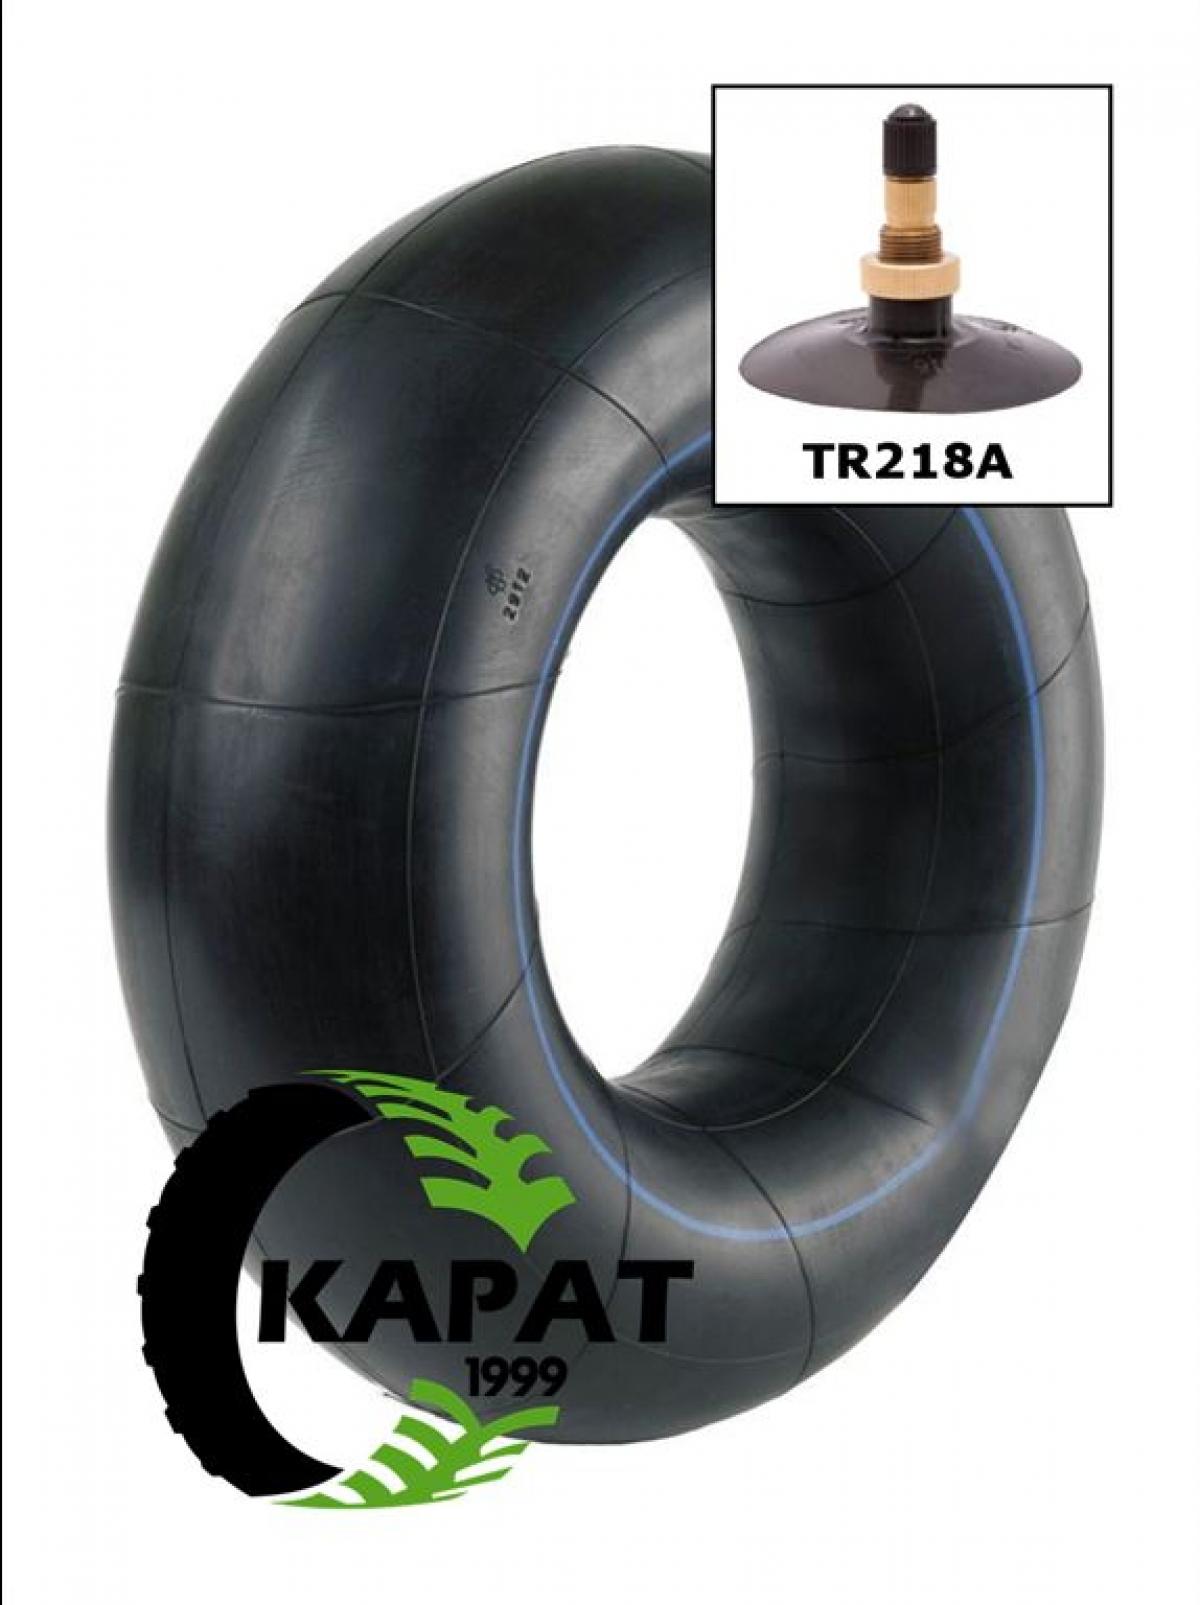 Камера 11,2-44 (270/95-44) TR-218A KABAT